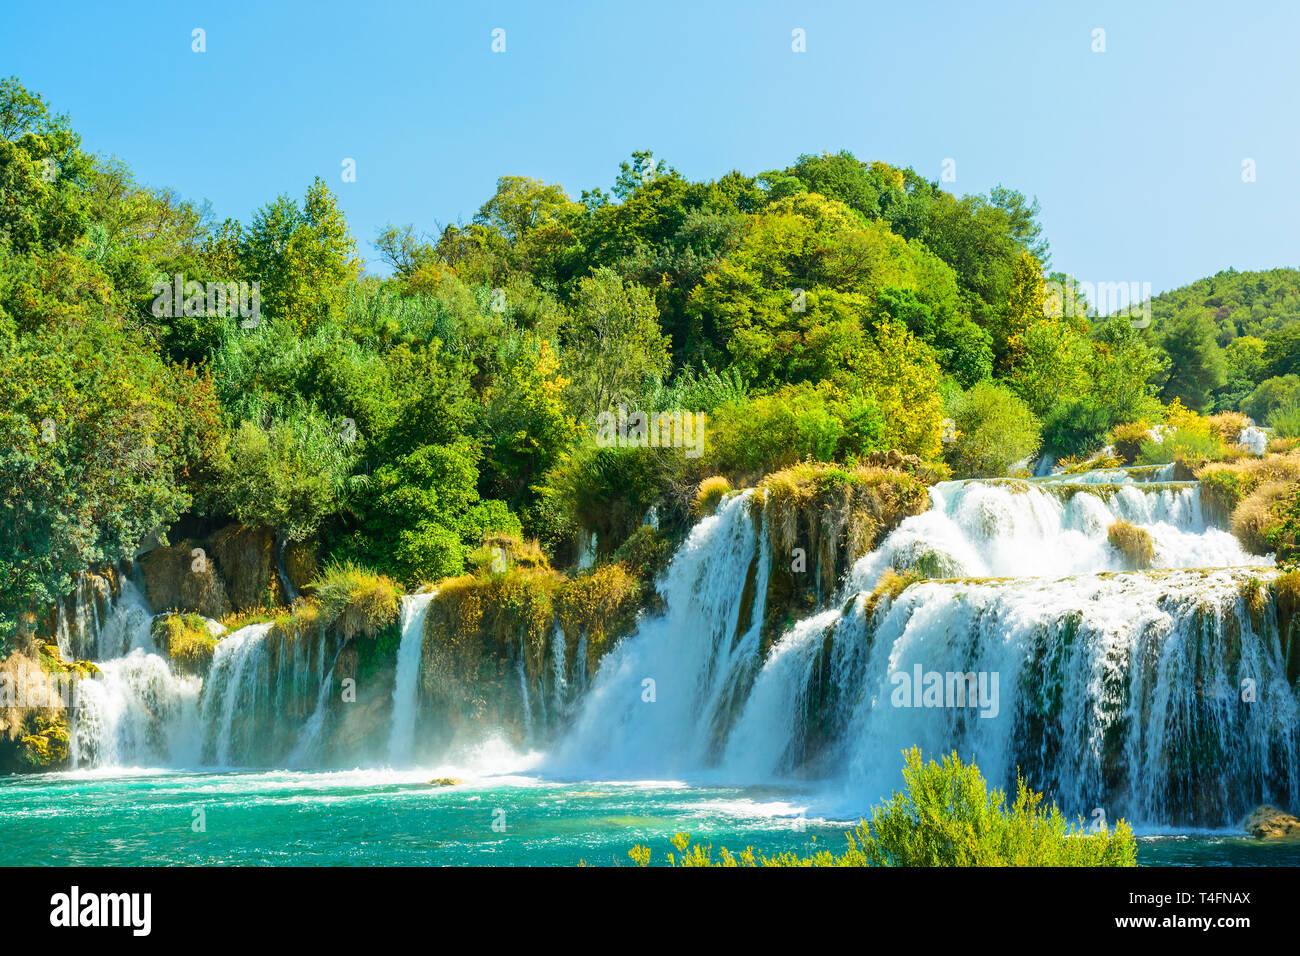 Schöne Skradinski Buk Wasserfall im Nationalpark Krka - Dalmatien Kroatien, Europa im sonnigen Tag Stockfoto